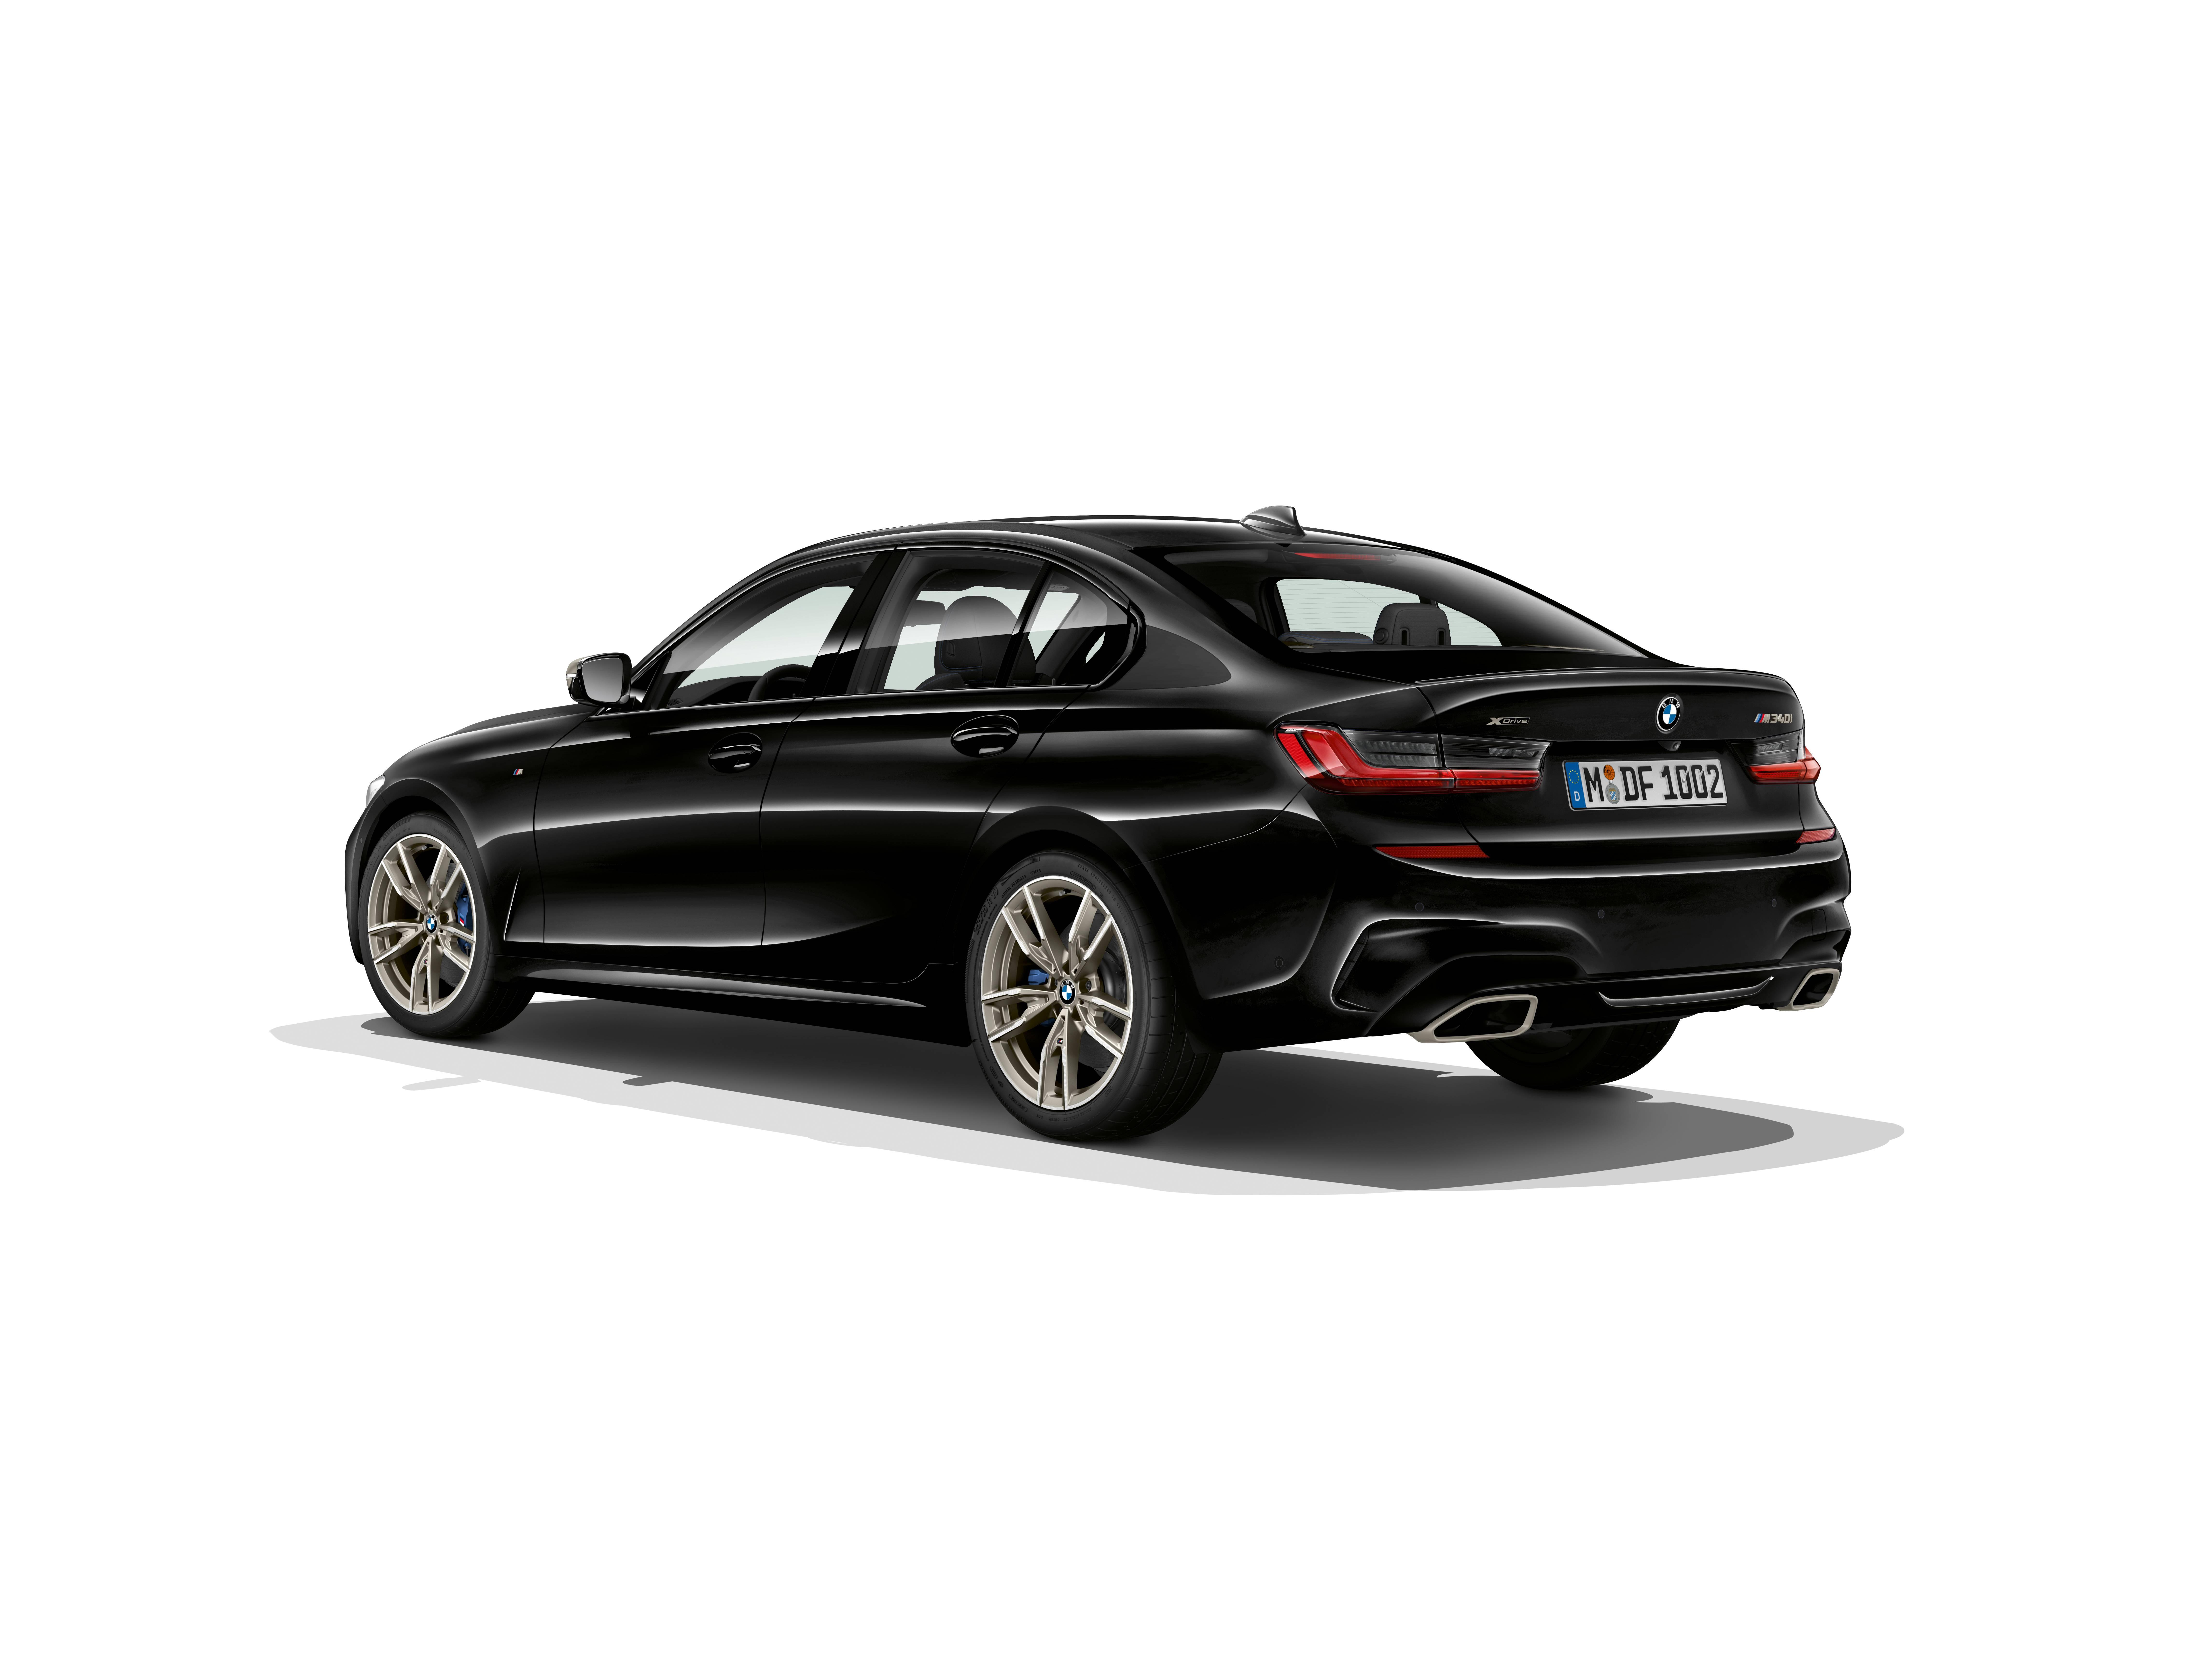 Bmw Wds Online Free 2020 Bmw M340i Xdrive Checks All the Luxury Boxes Of Bmw Wds Online Free